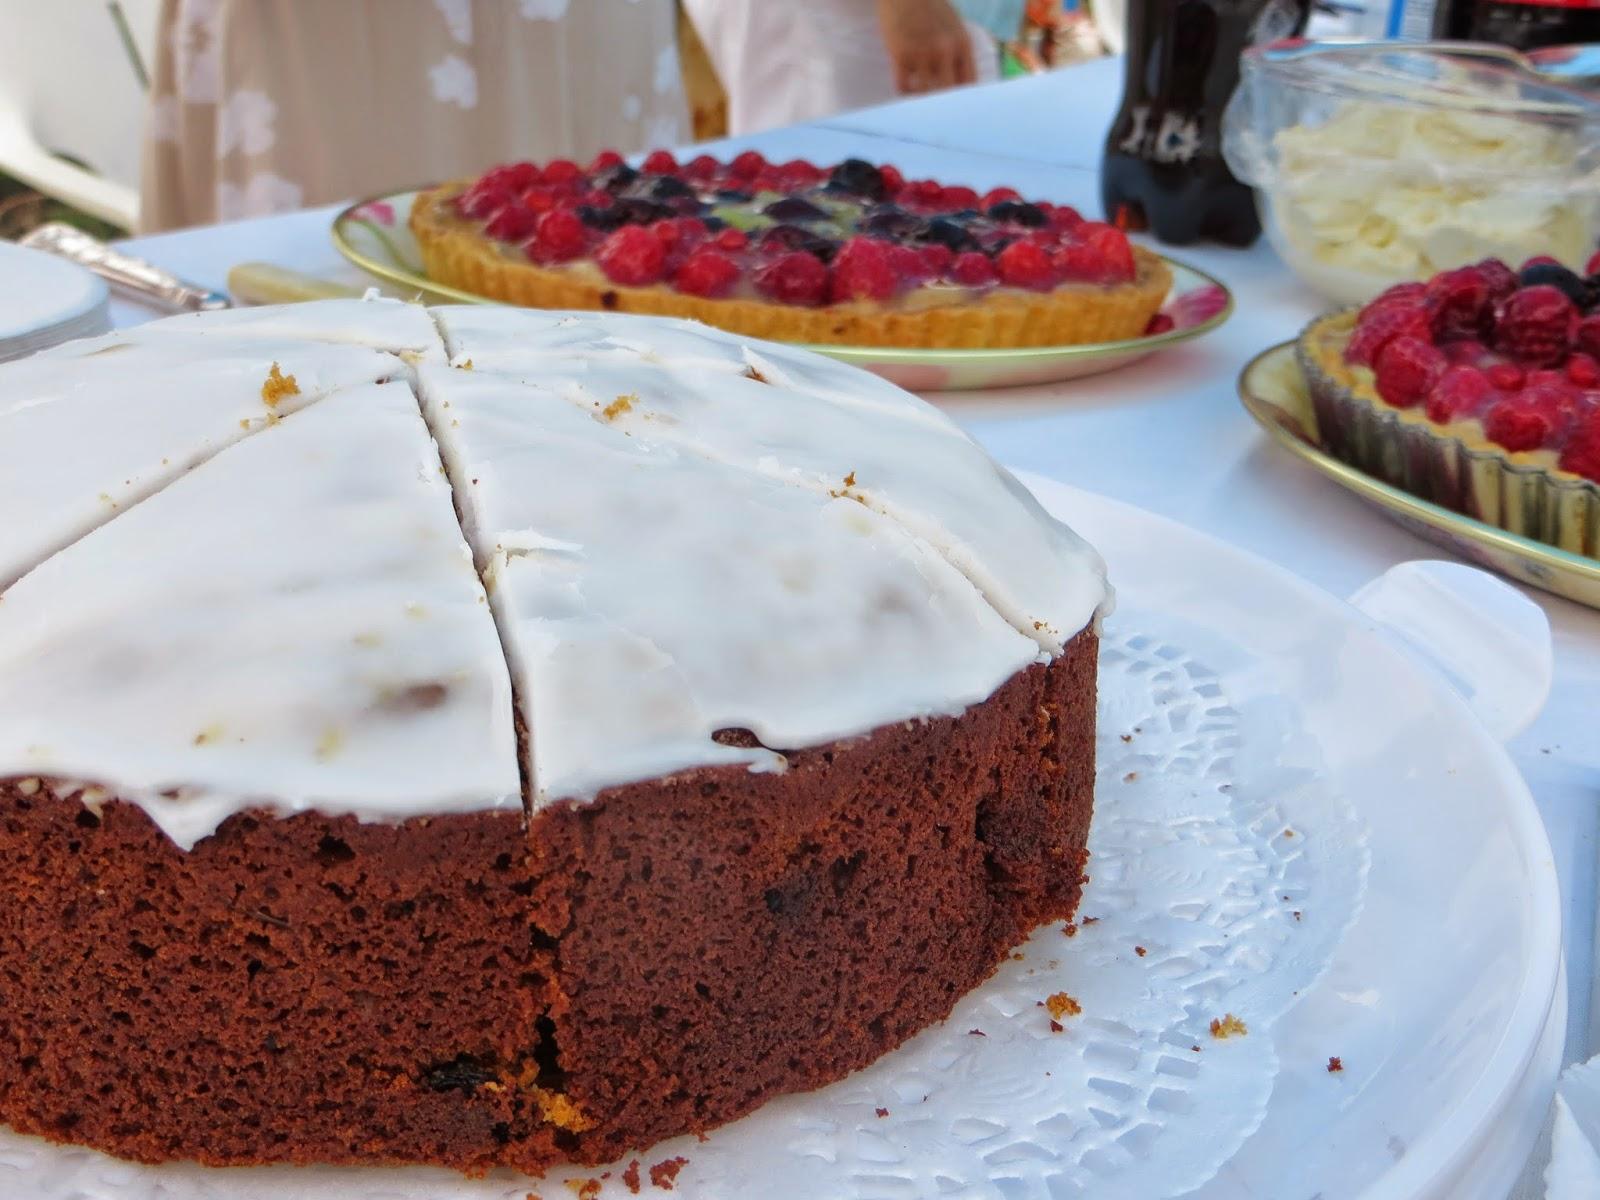 Another wonderful homemade cake.